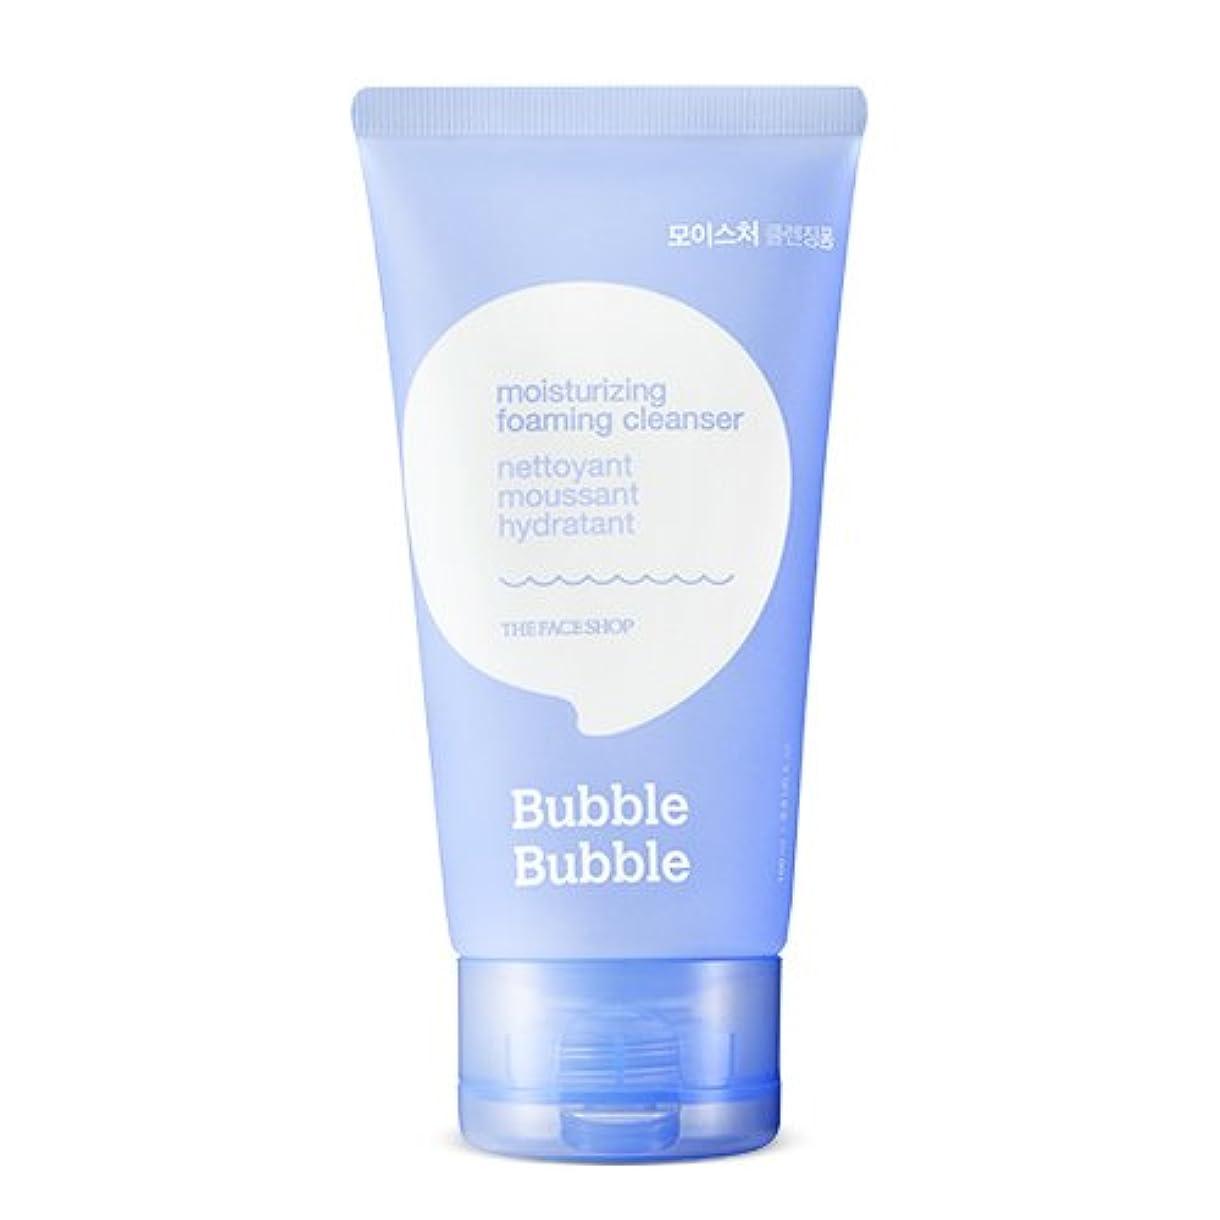 THE FACE SHOP Bubble Bubble Foaming Cleanser 100ml/ザフェイスショップ バブル バブル フォーミング クレンザー 100ml (#Moisturizing(モイスチャー)...